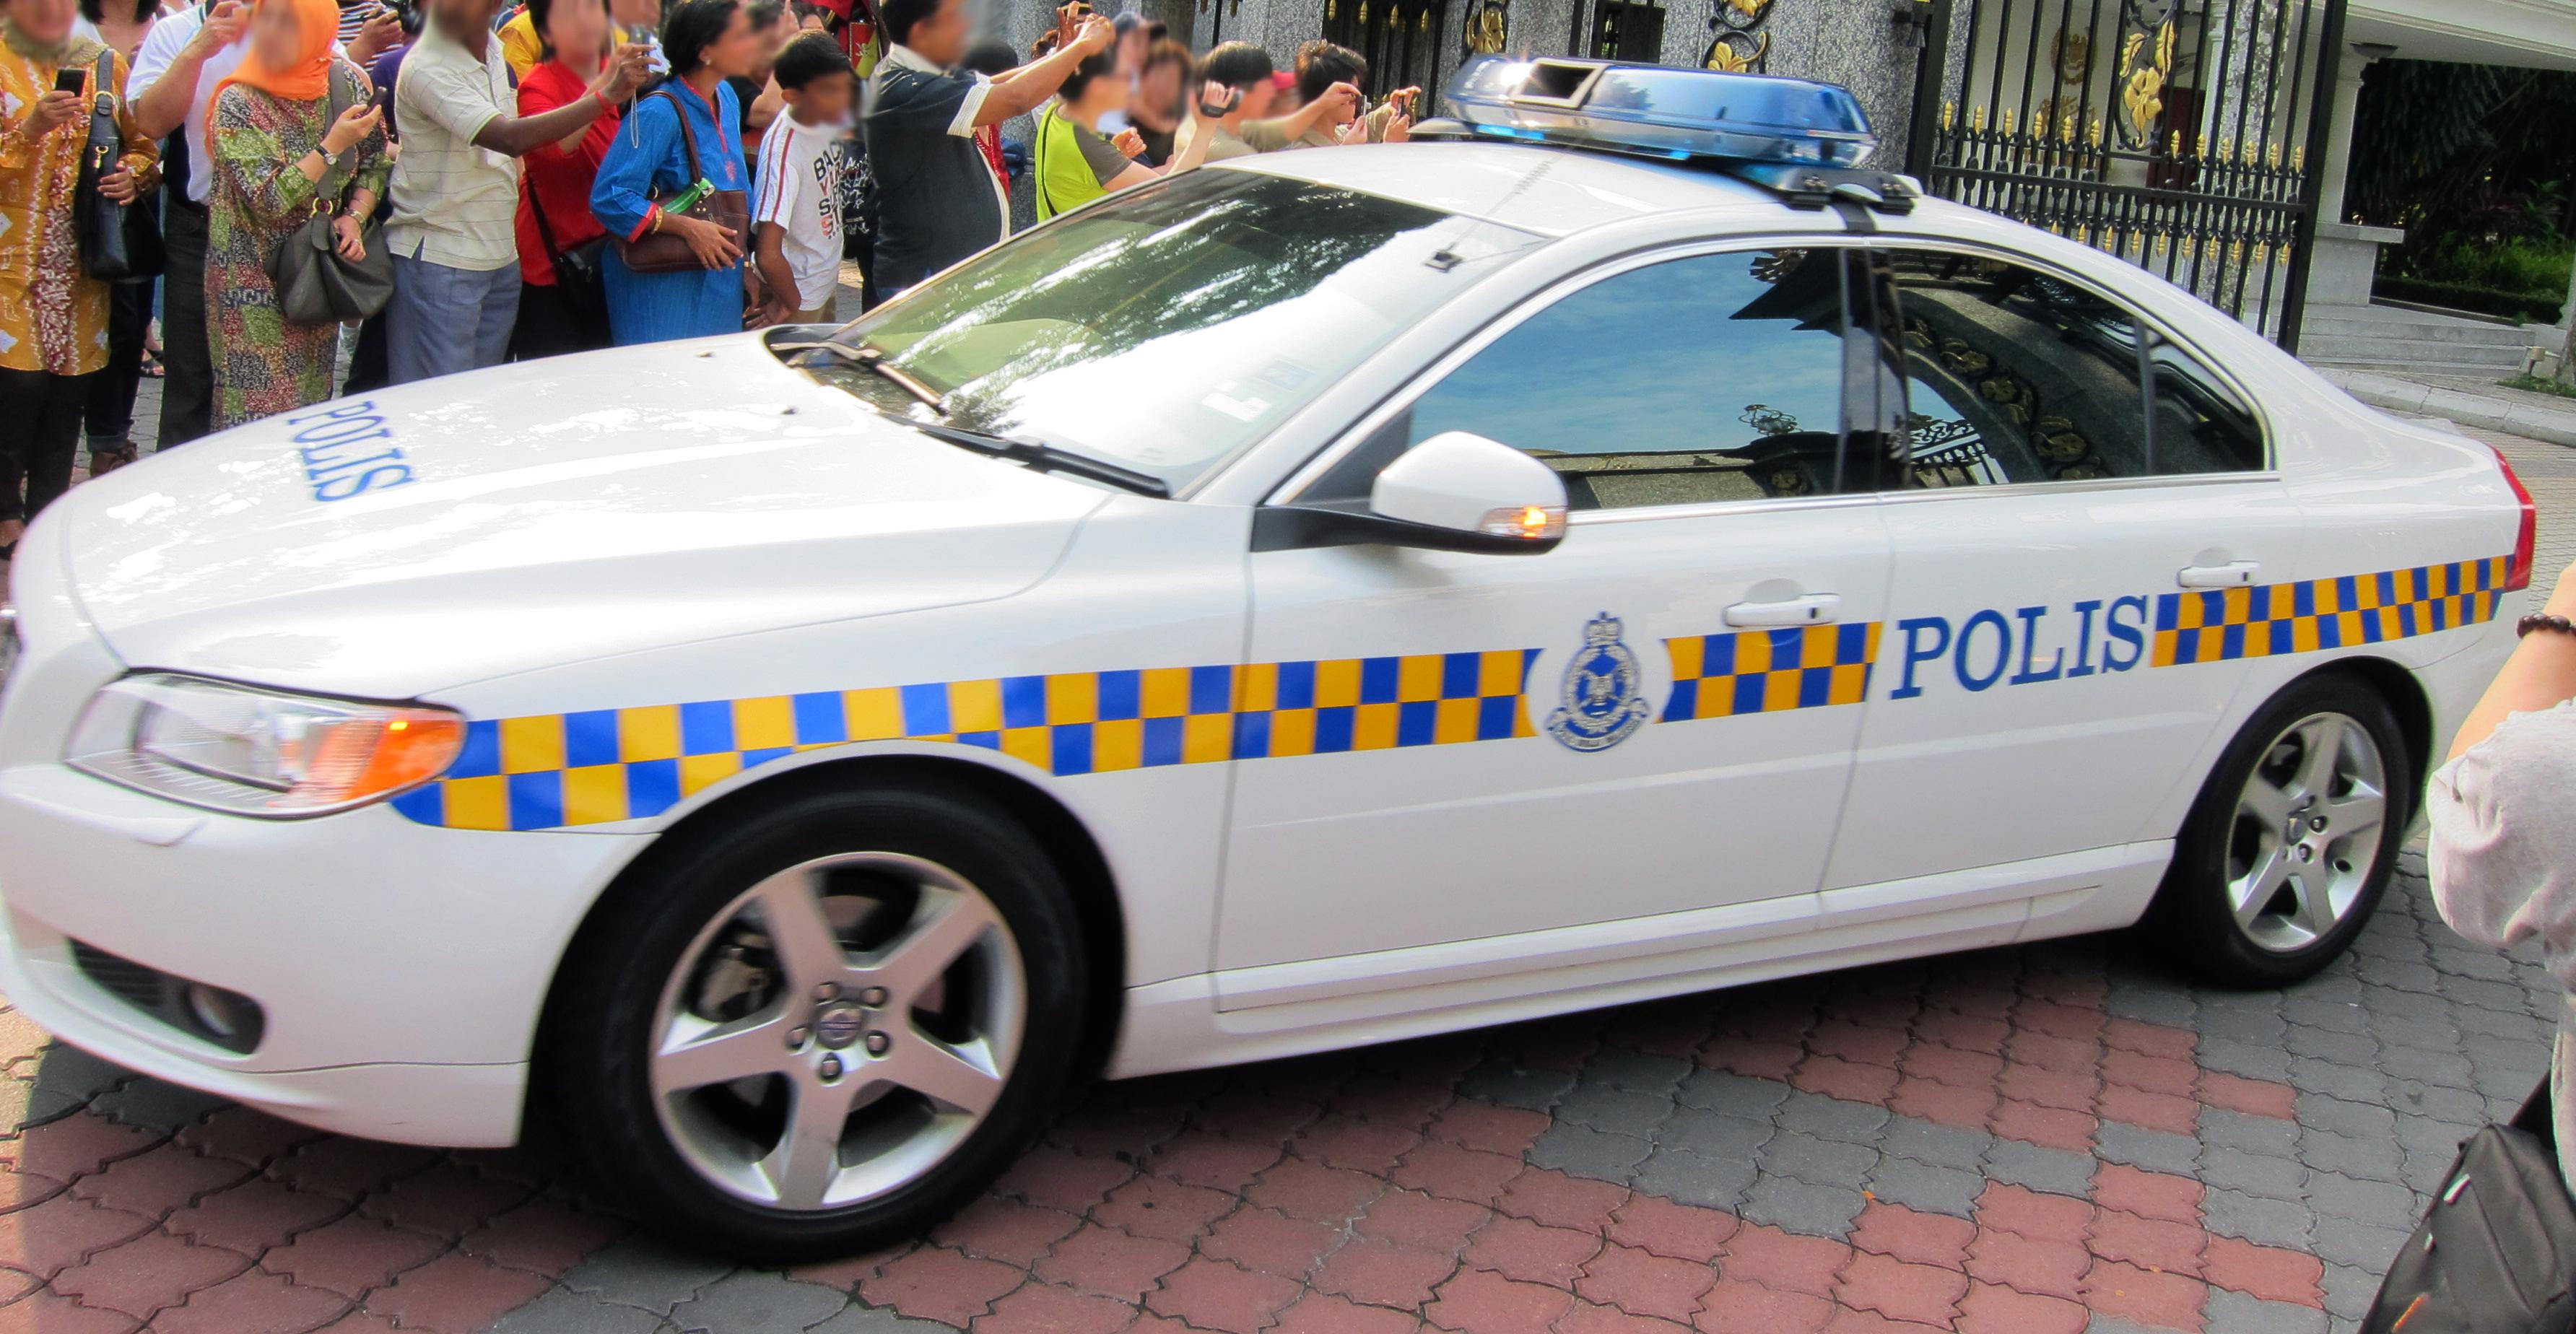 File:Volvo S80 Polis.jpg - Wikimedia Commons